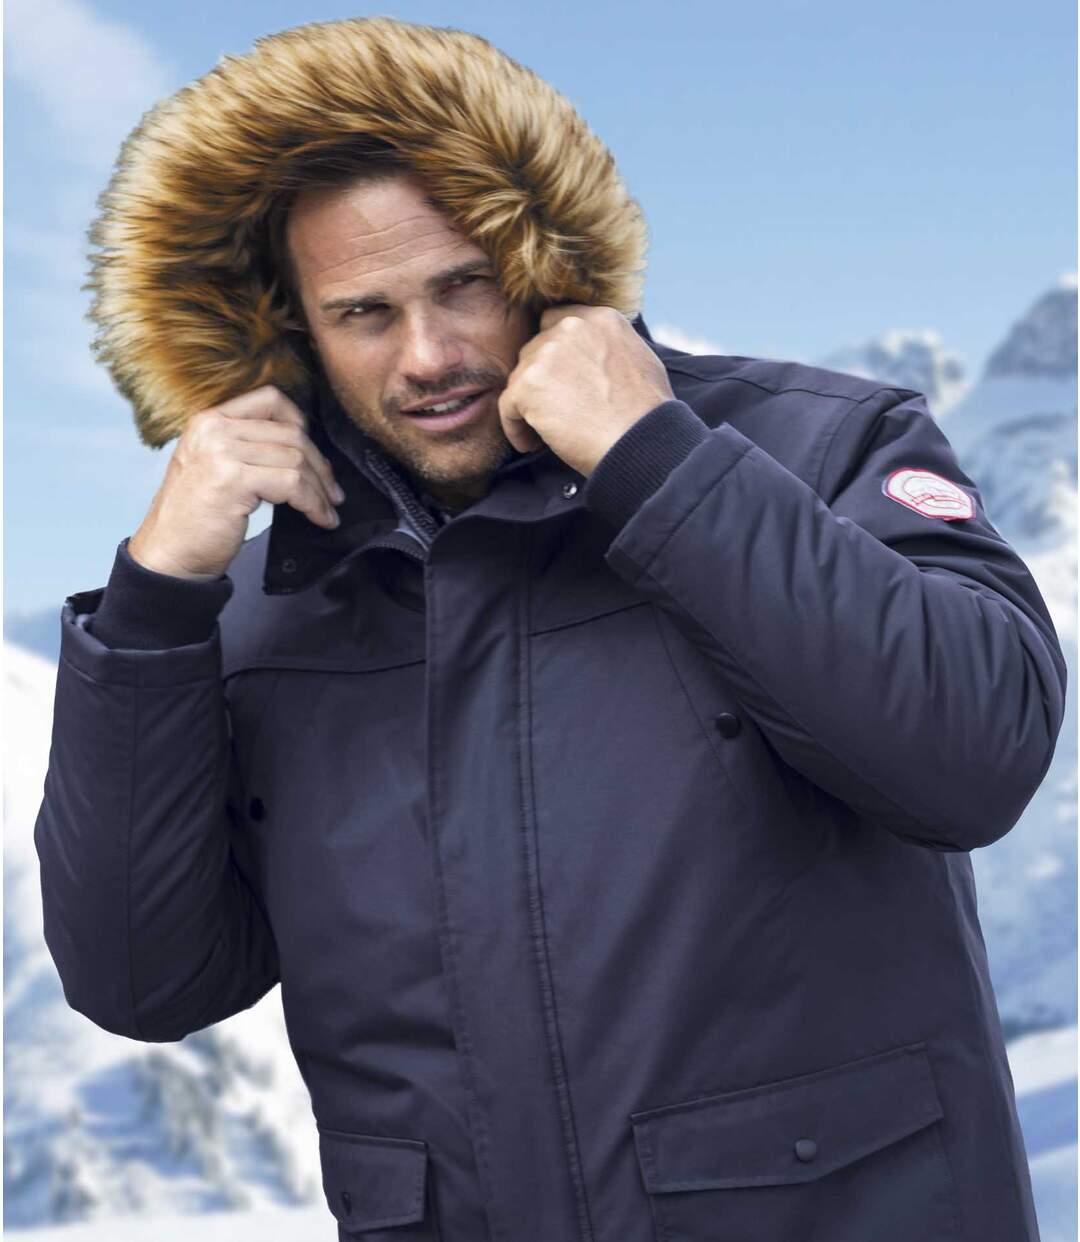 Parka Klirrende Kälte mit wattierter Kapuze